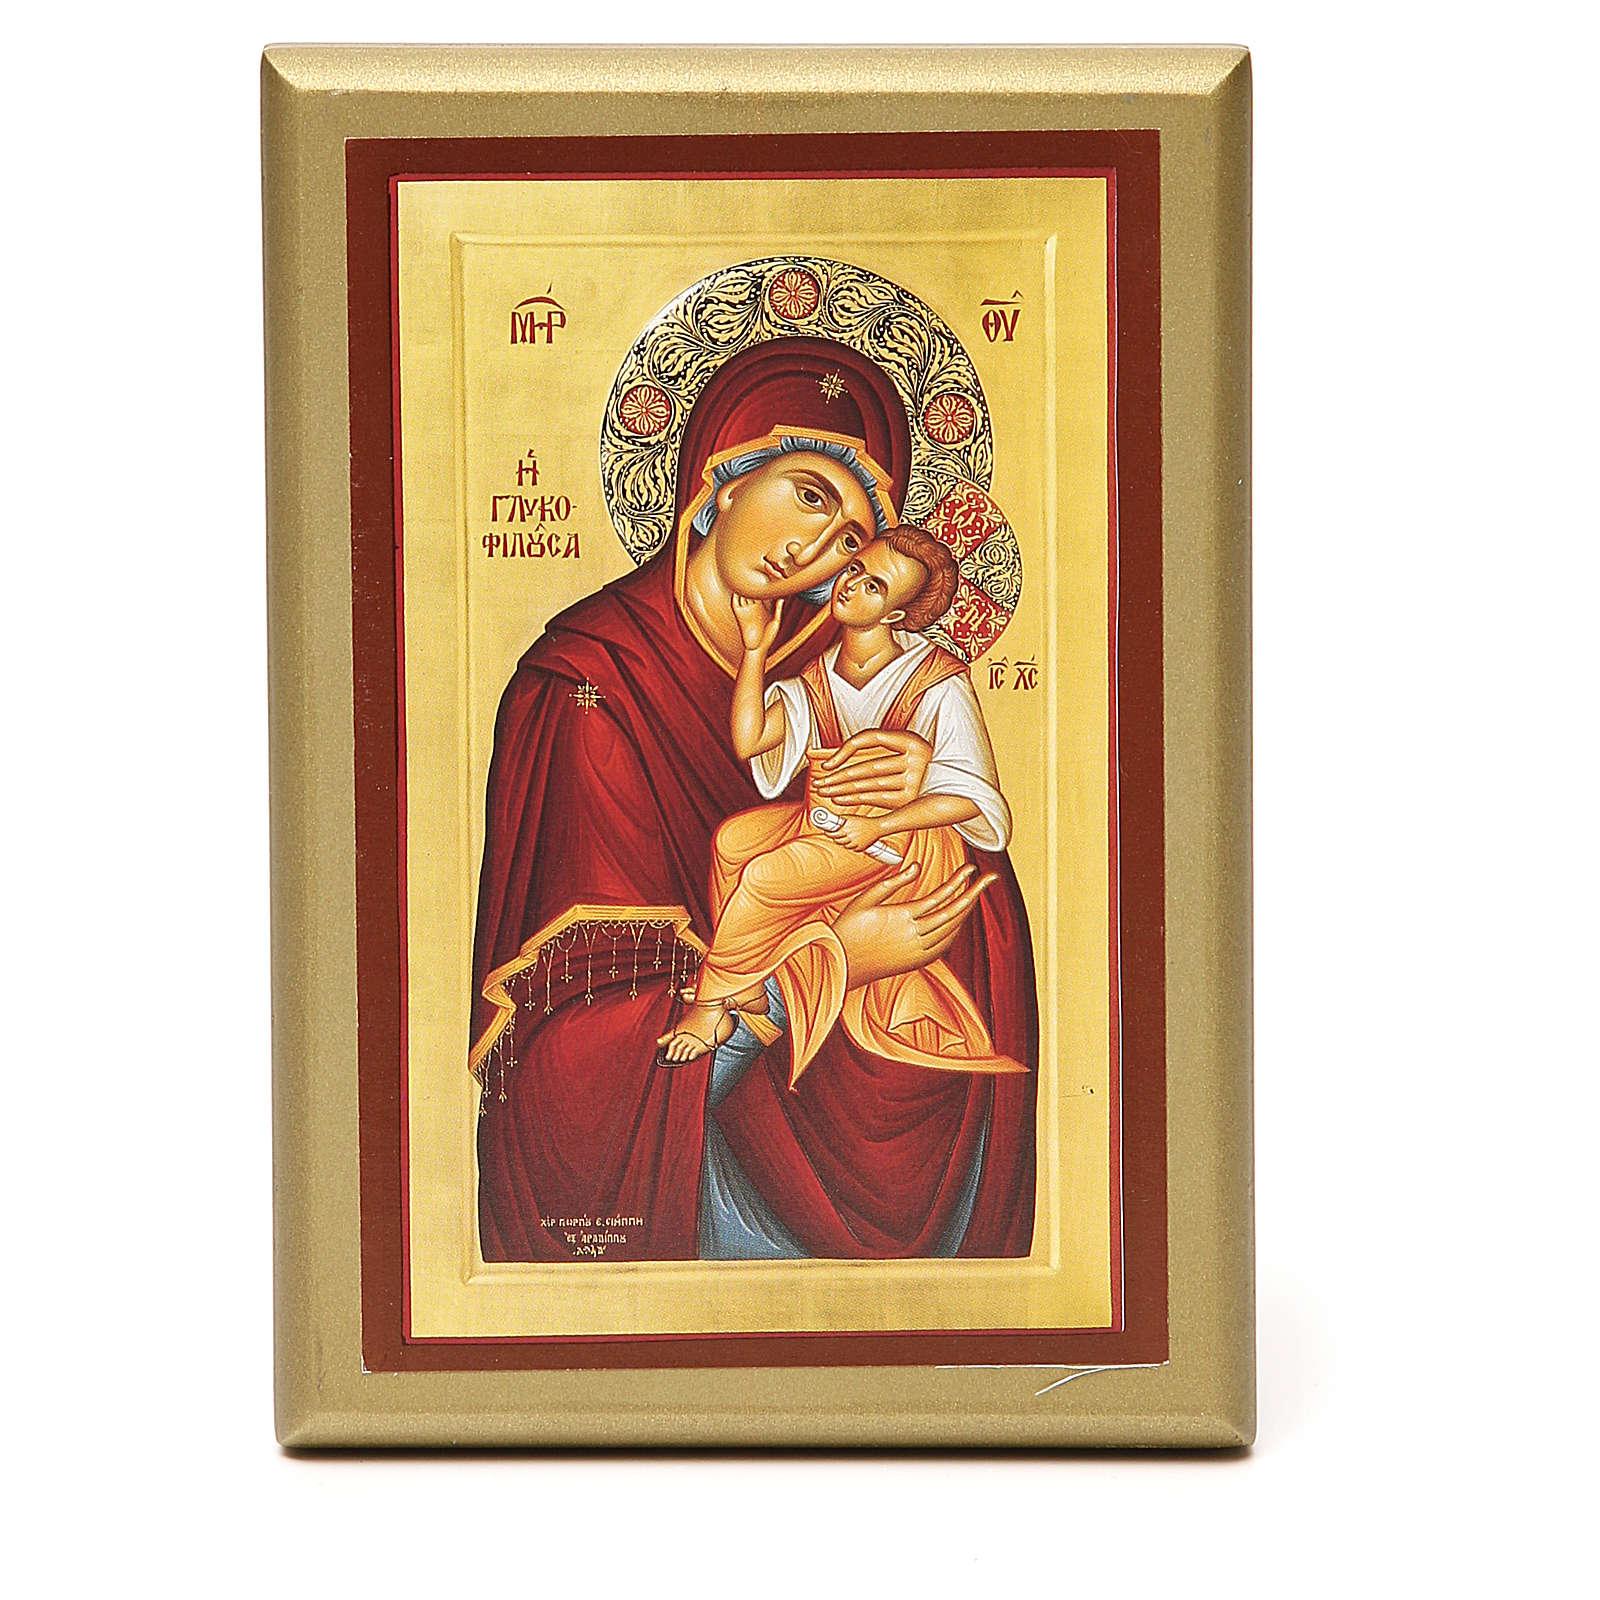 STOCK Cuadrito madera Virgen con niño 15x10 cm 3